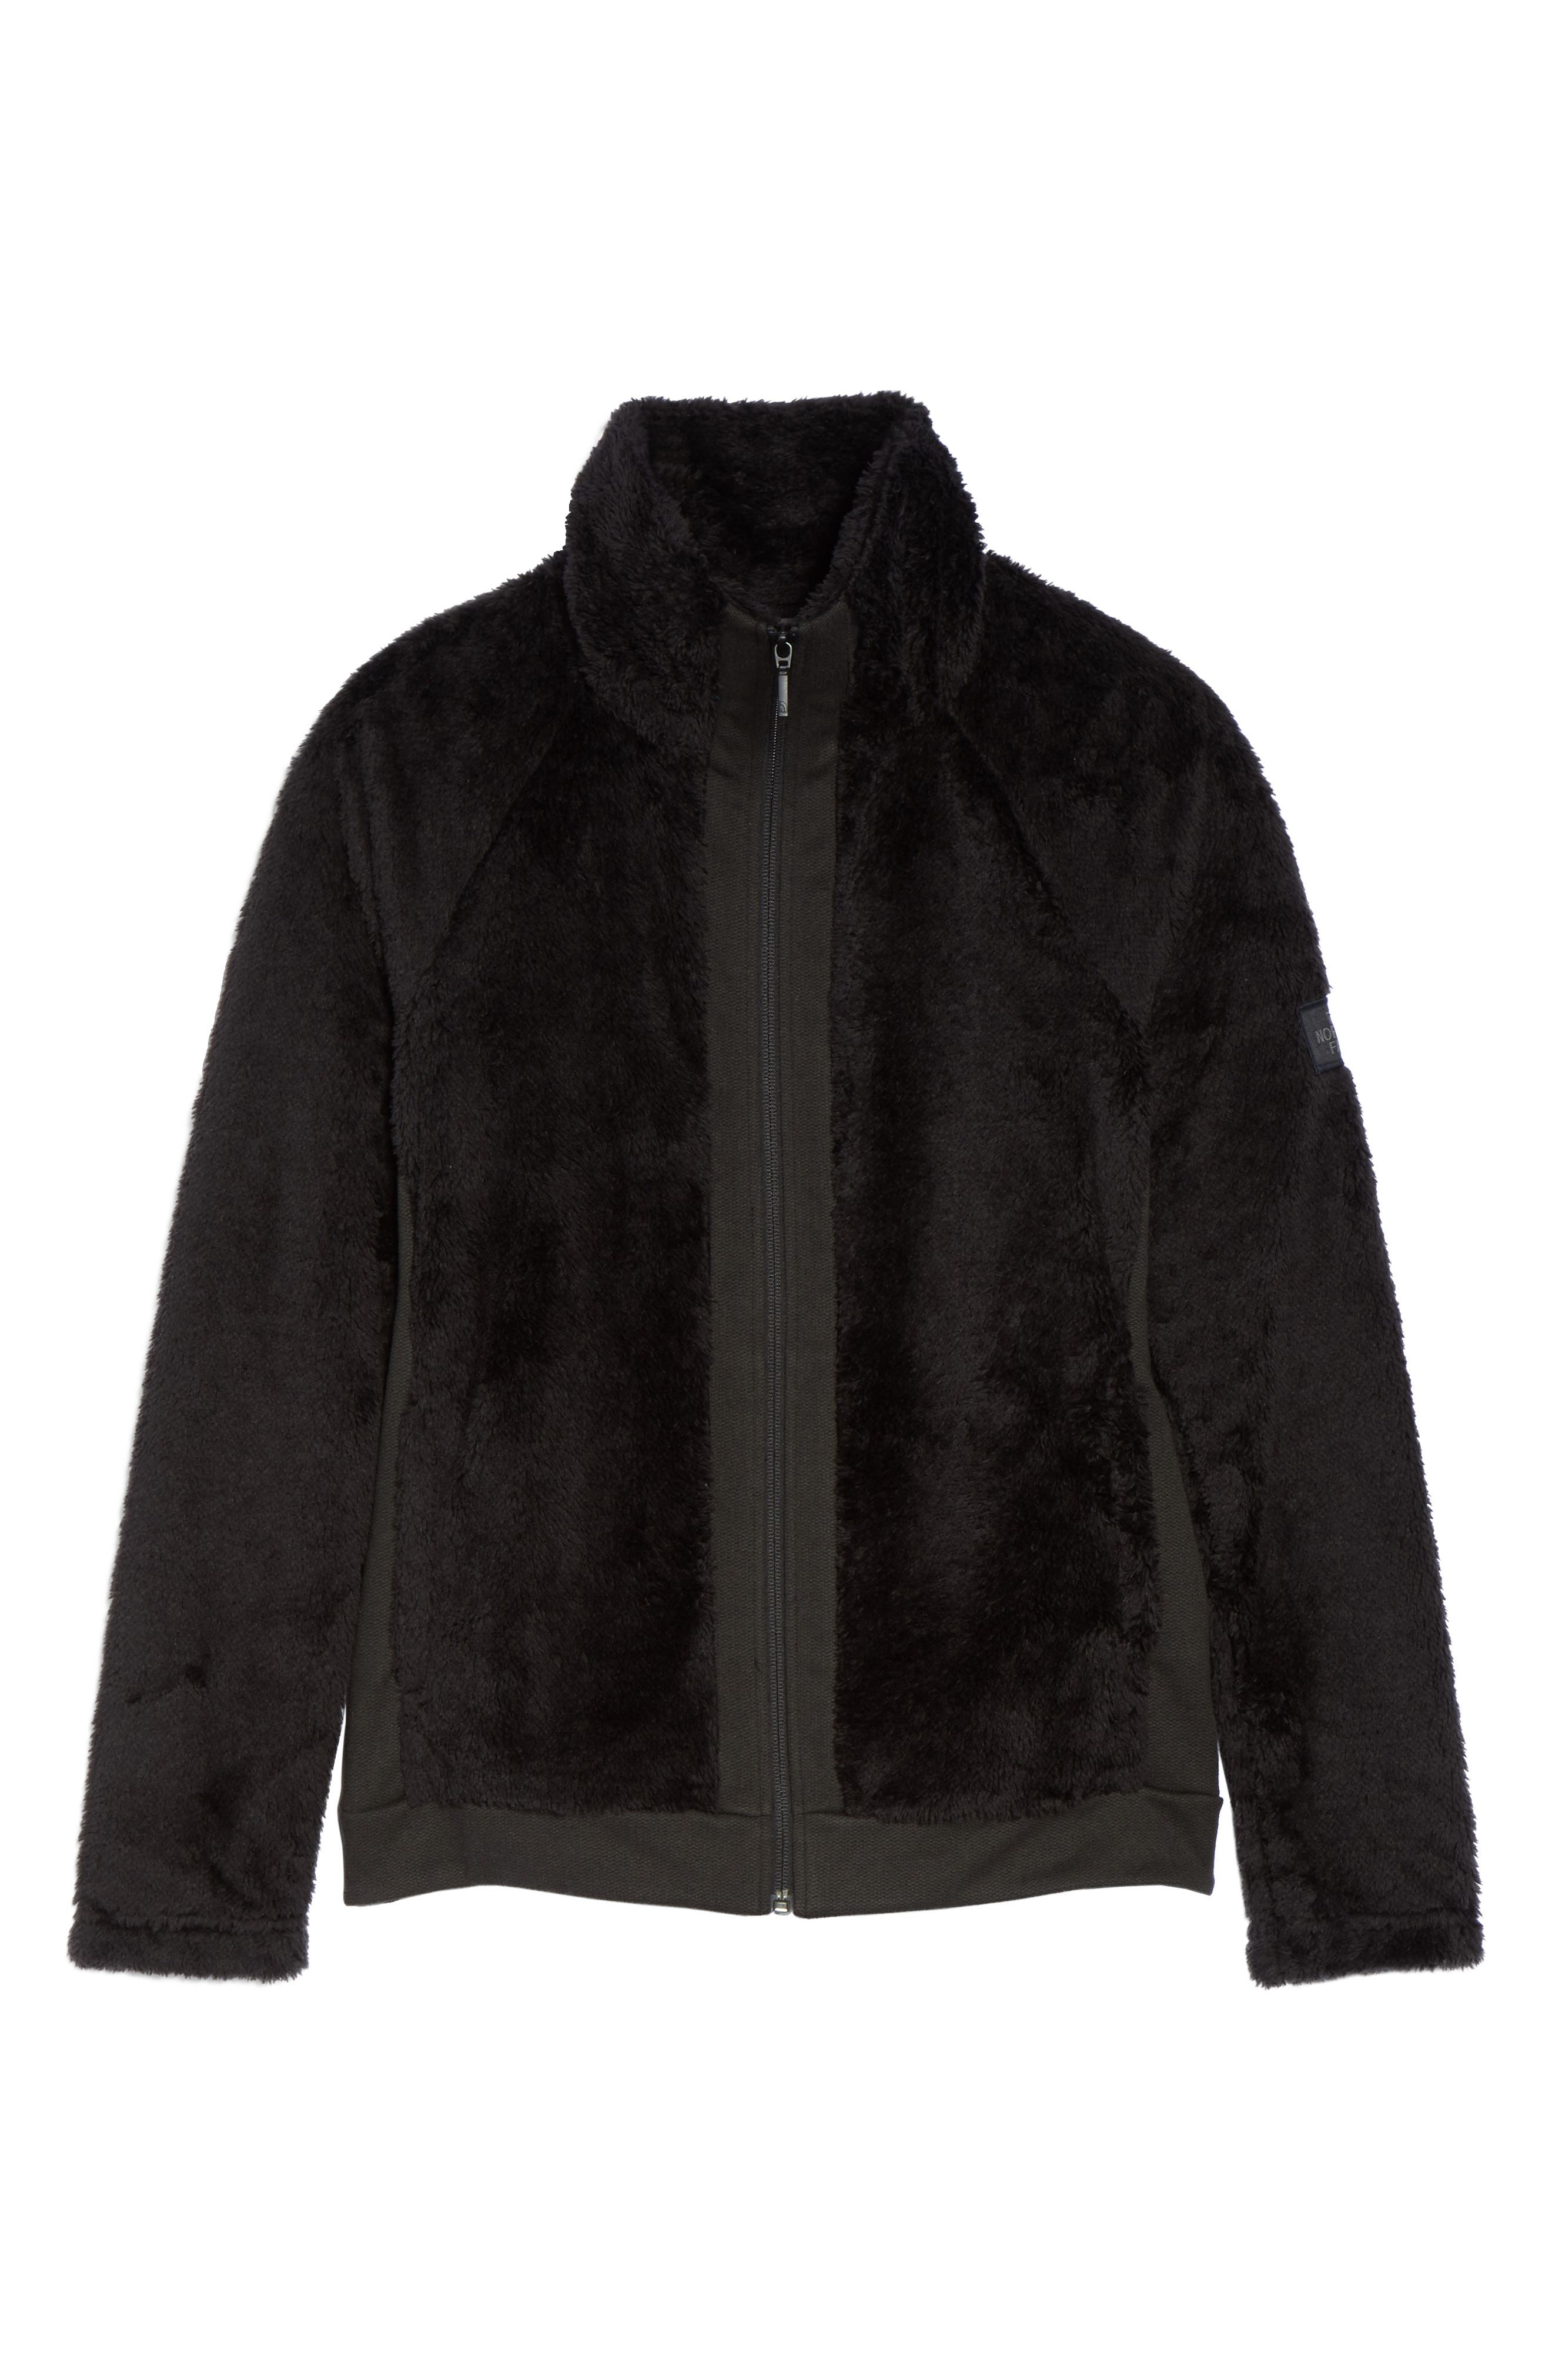 Furry Fleece Jacket,                             Alternate thumbnail 6, color,                             TNF BLACK